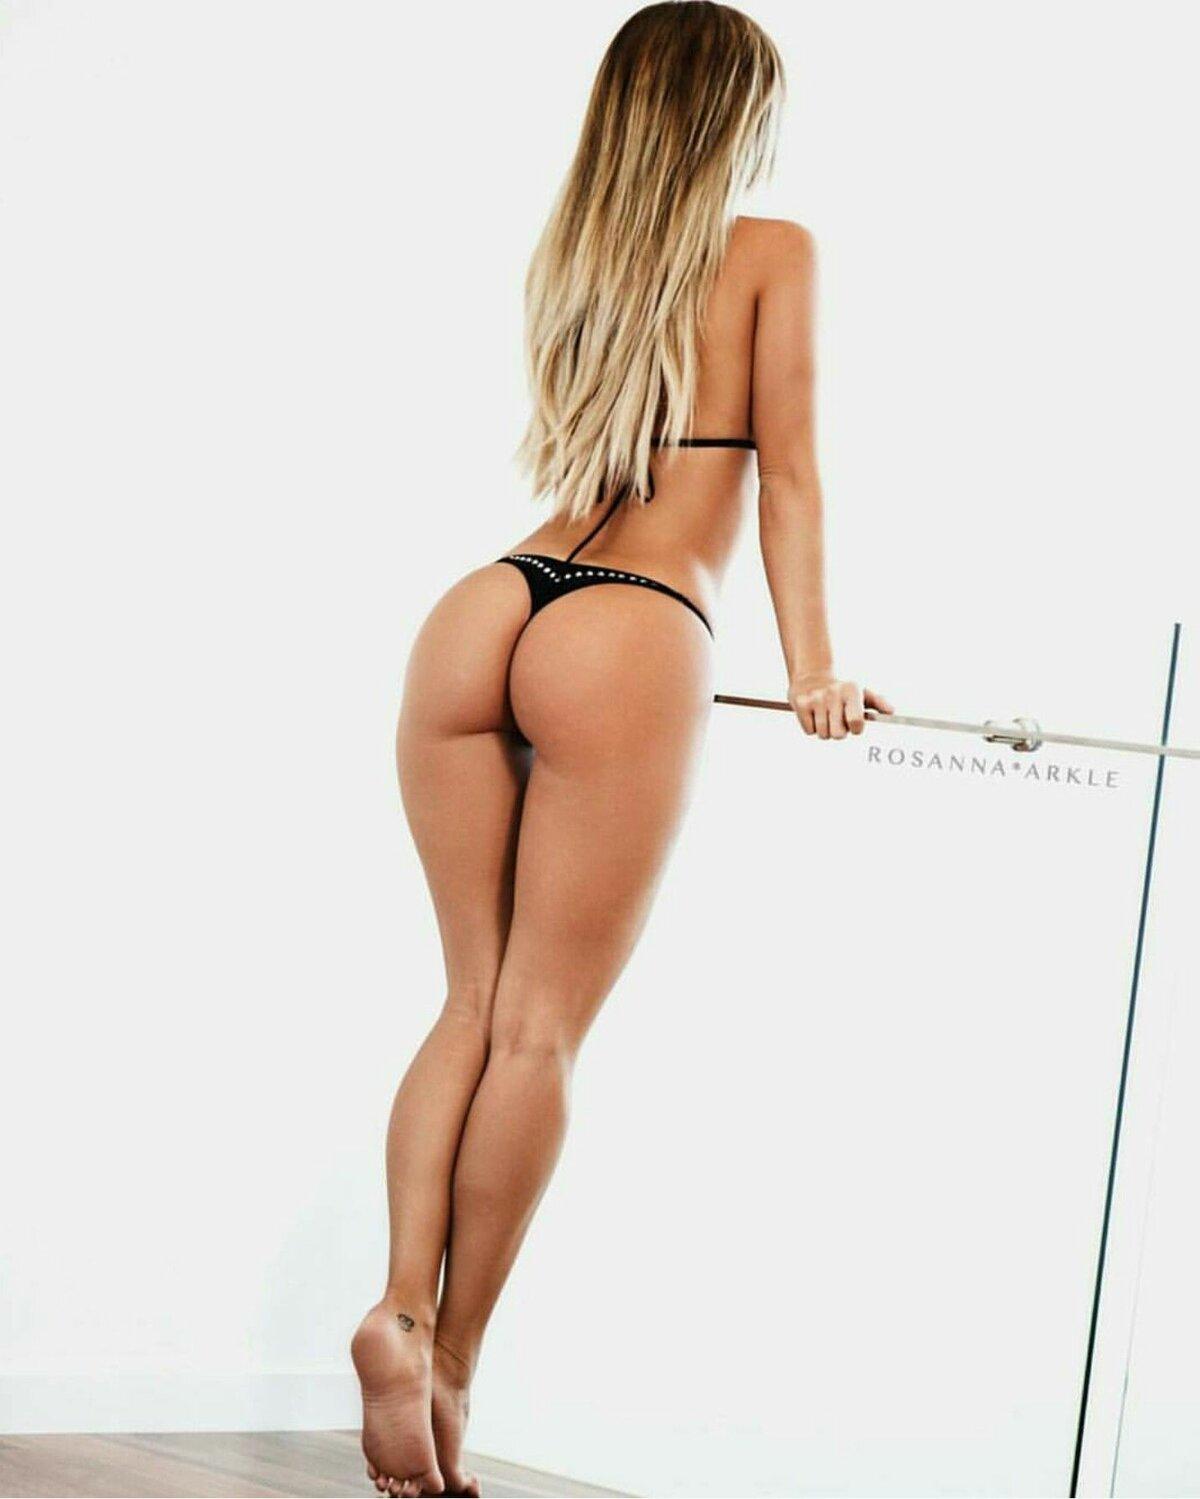 Rosanna arkle naked